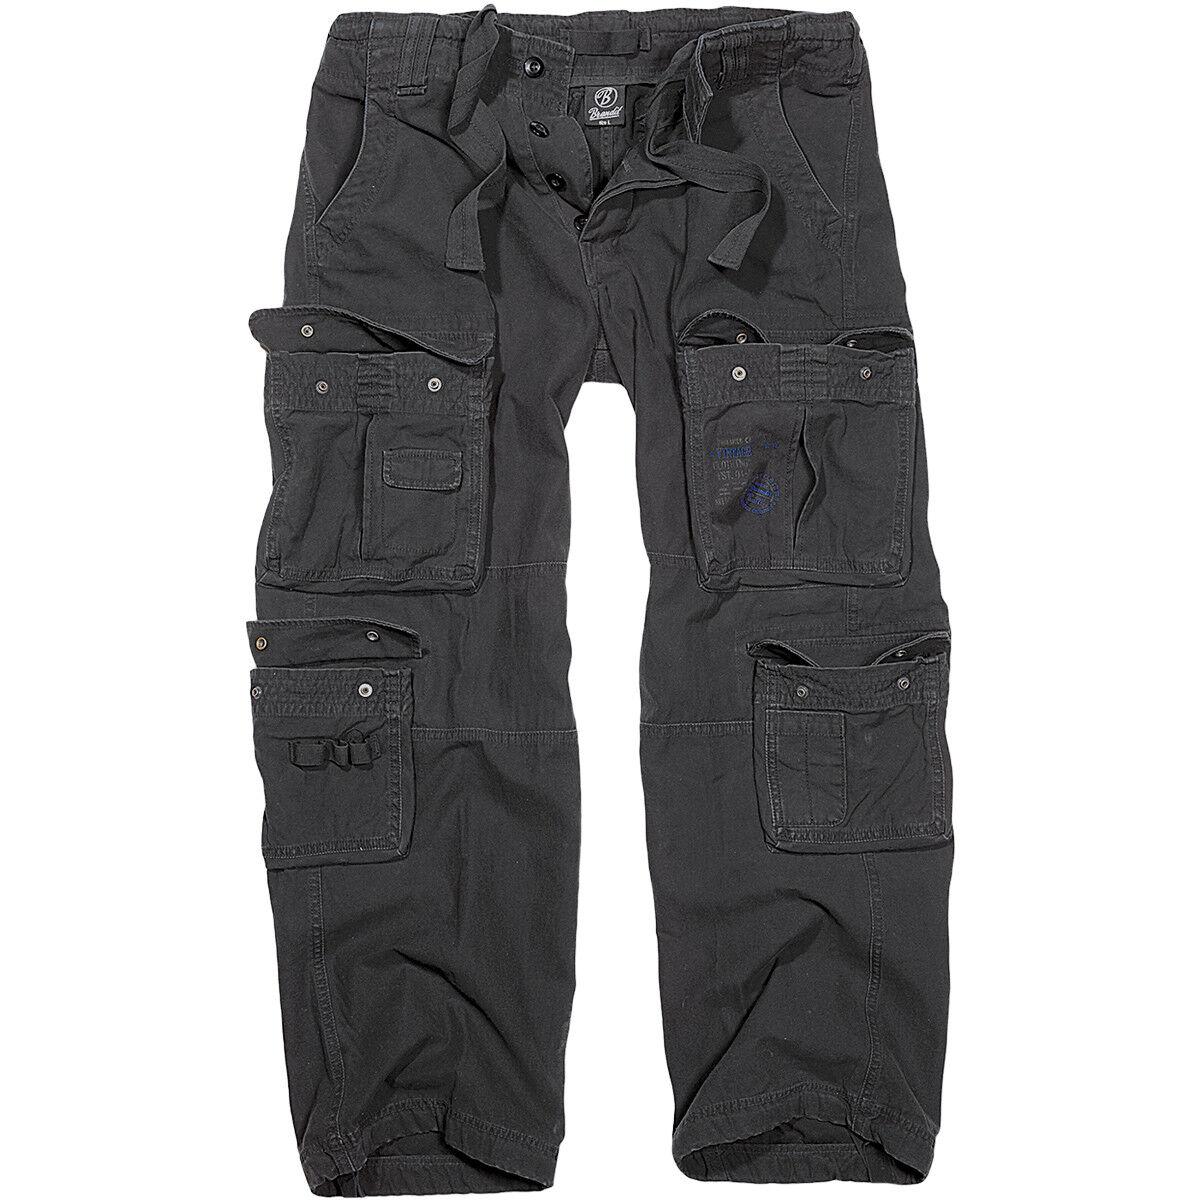 Brandit Brandit Brandit Uomo Puro Vintage Polizia Combattere Pantaloni Sicurezza Lavoro Cargo Pa ee84ce